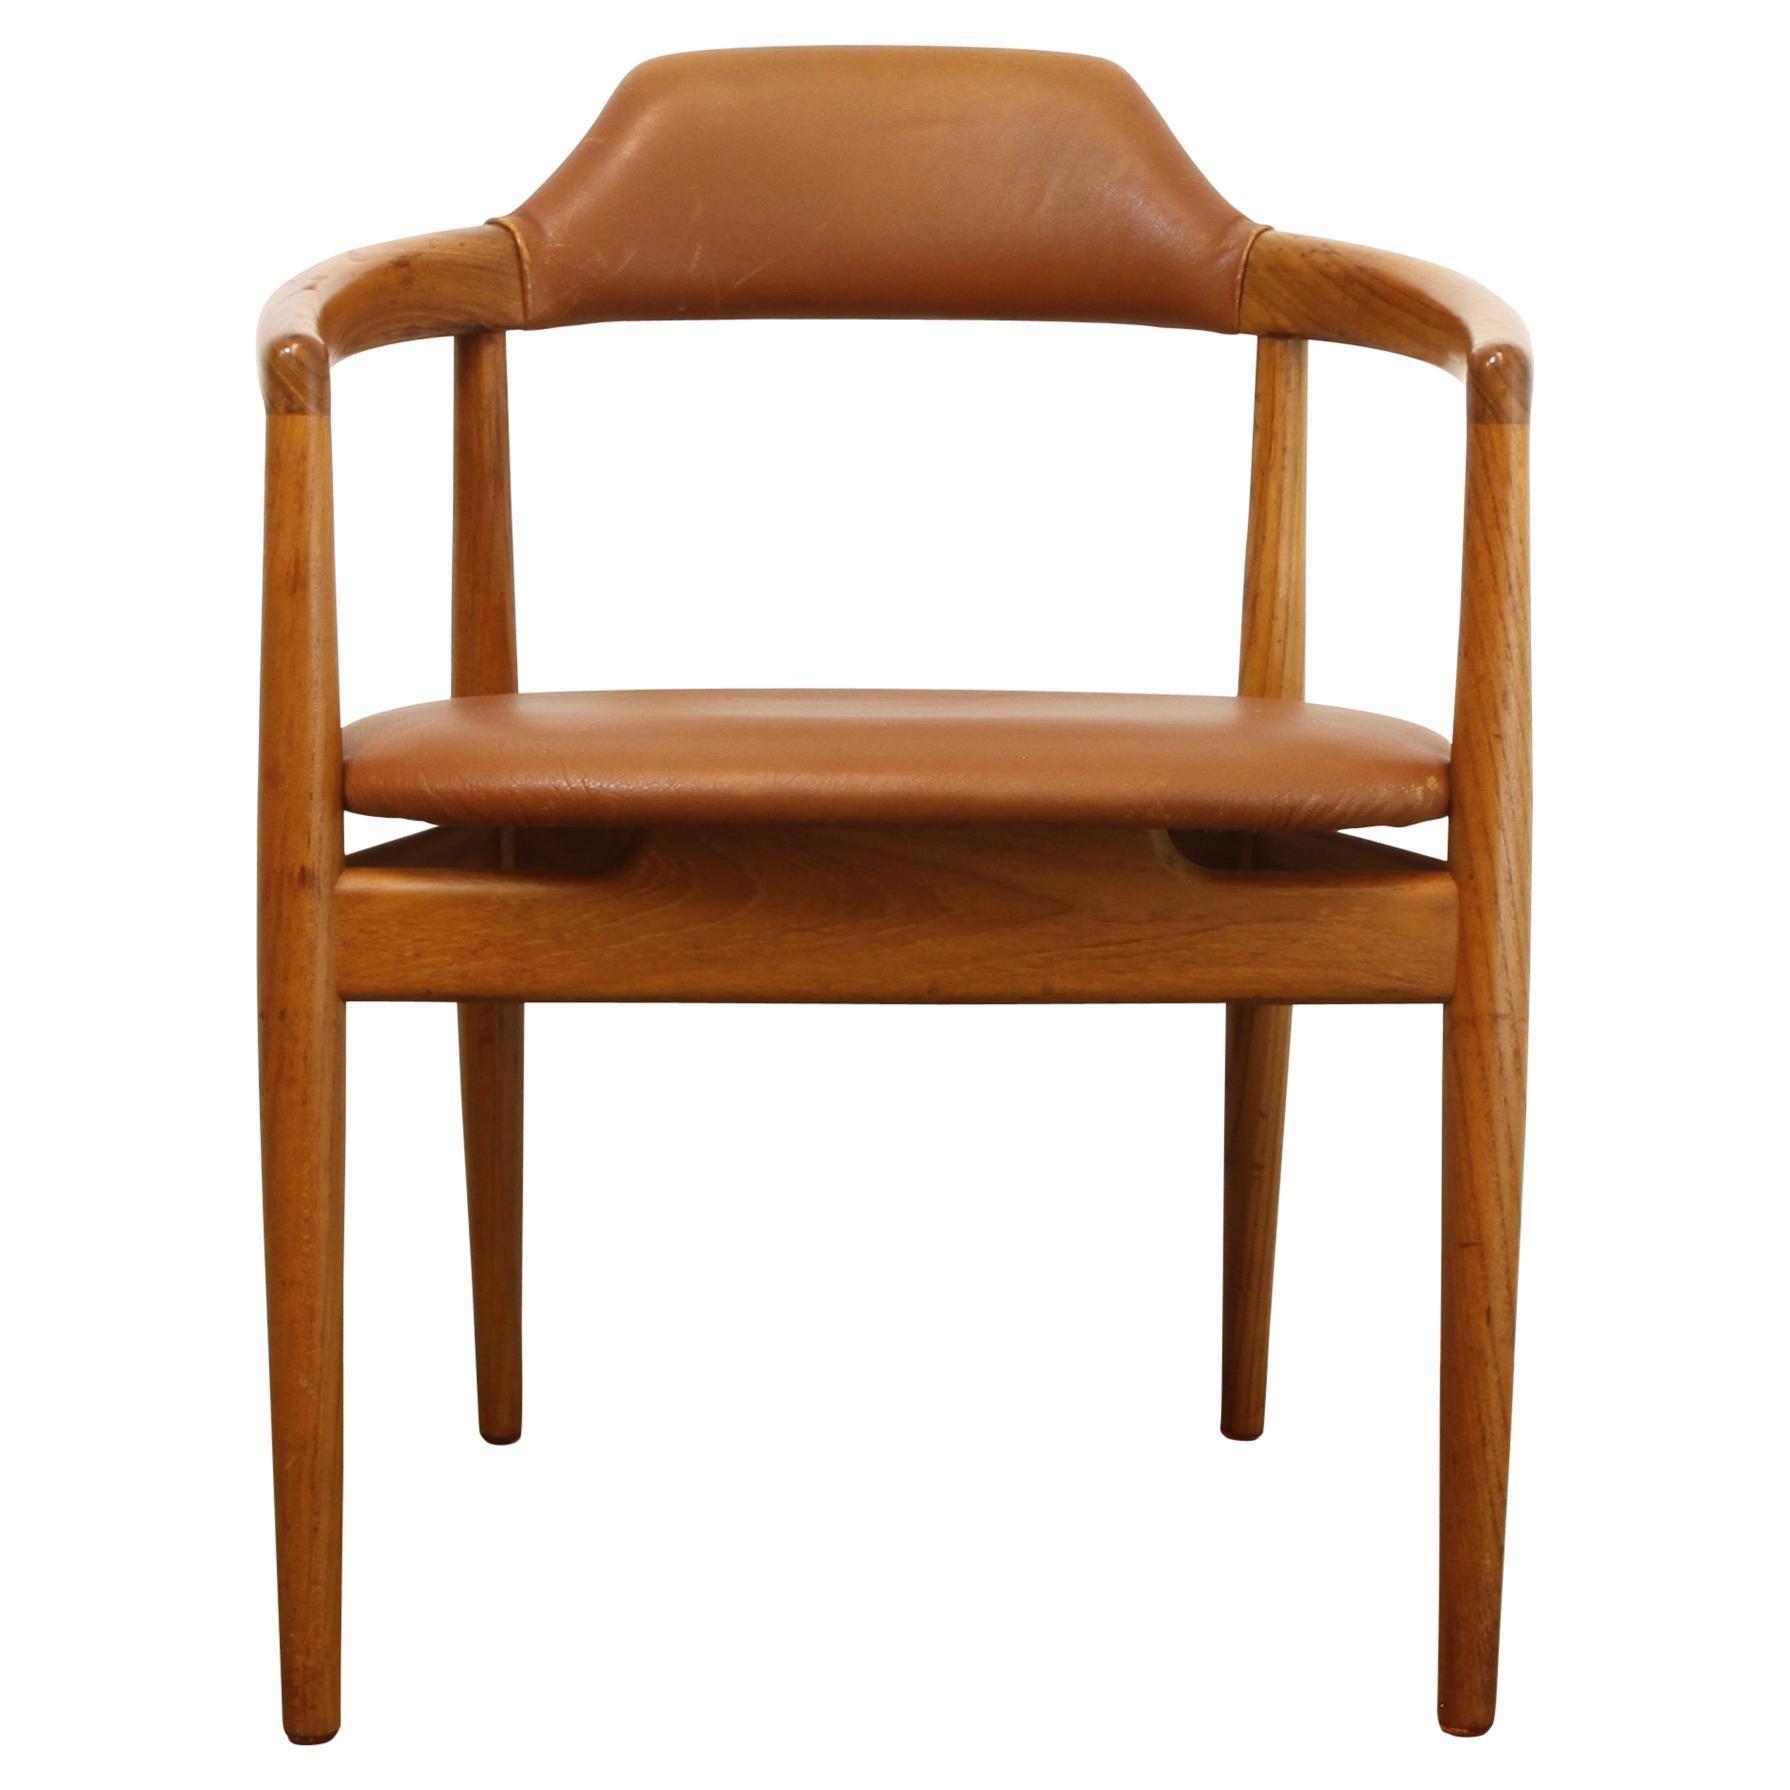 Vintage Danish Teak and Leather Armchair, 1960s